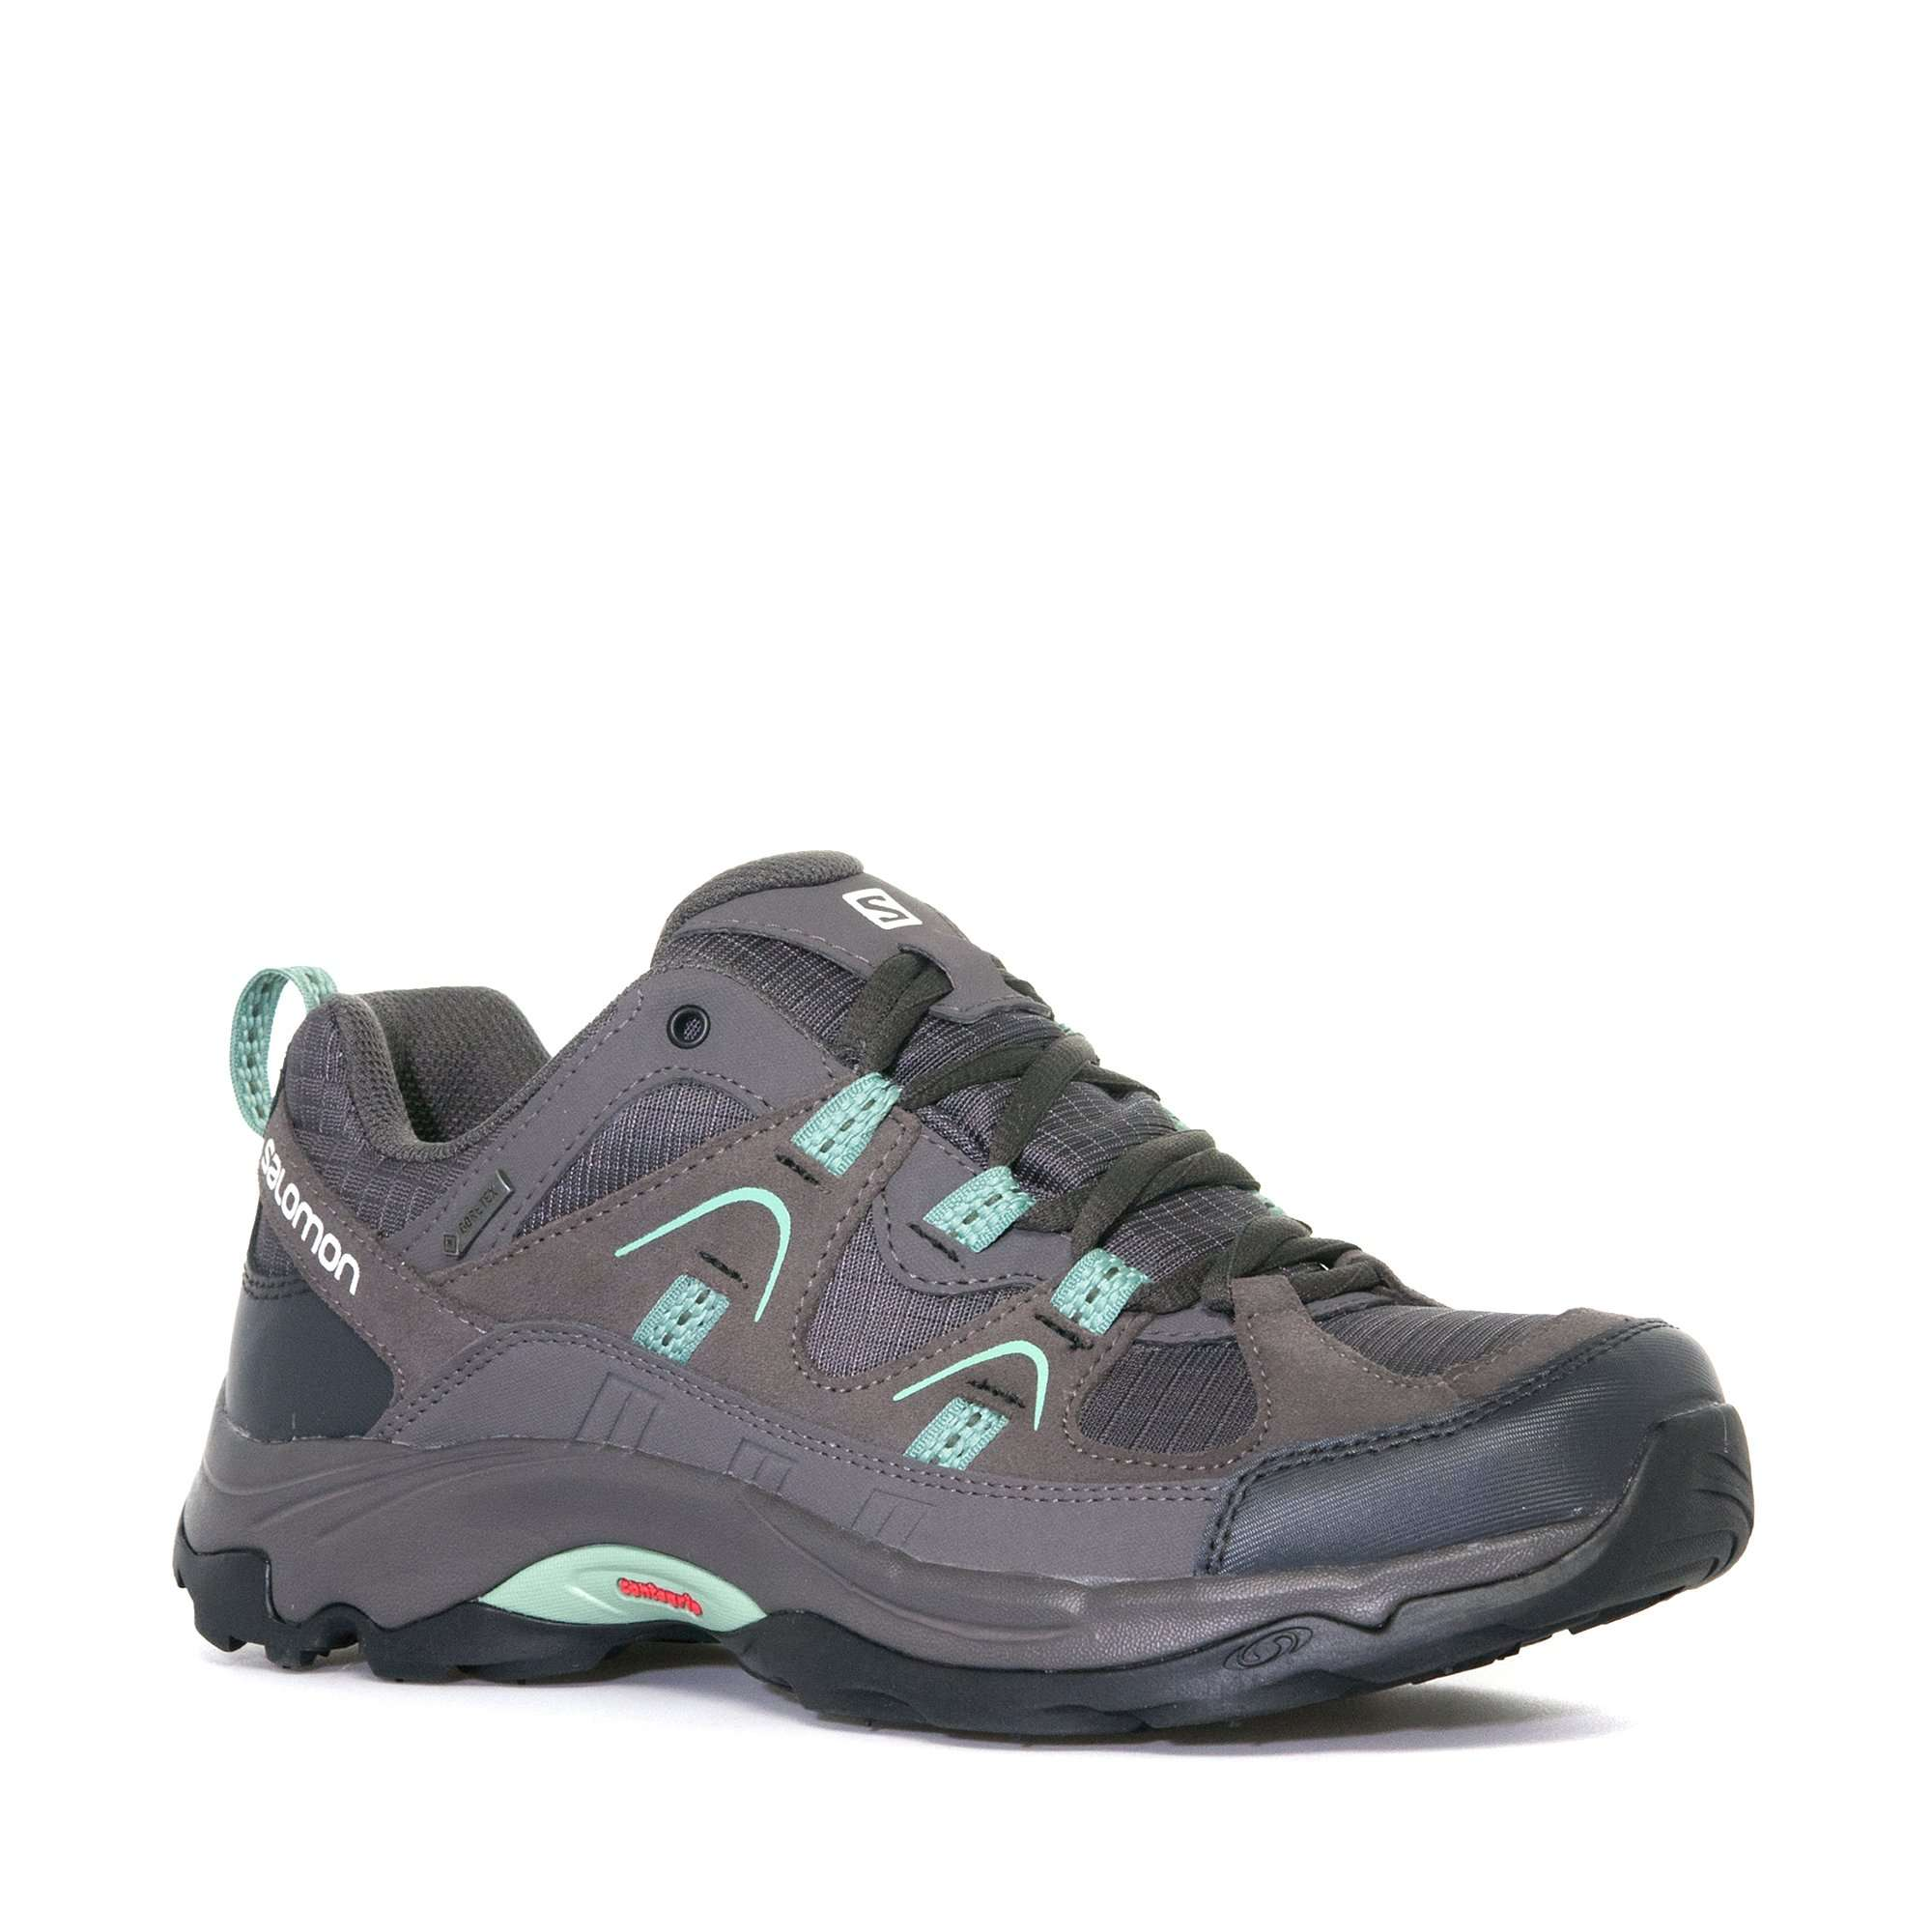 SALOMON Women's Loma GORE-TEX® Hiking Shoe